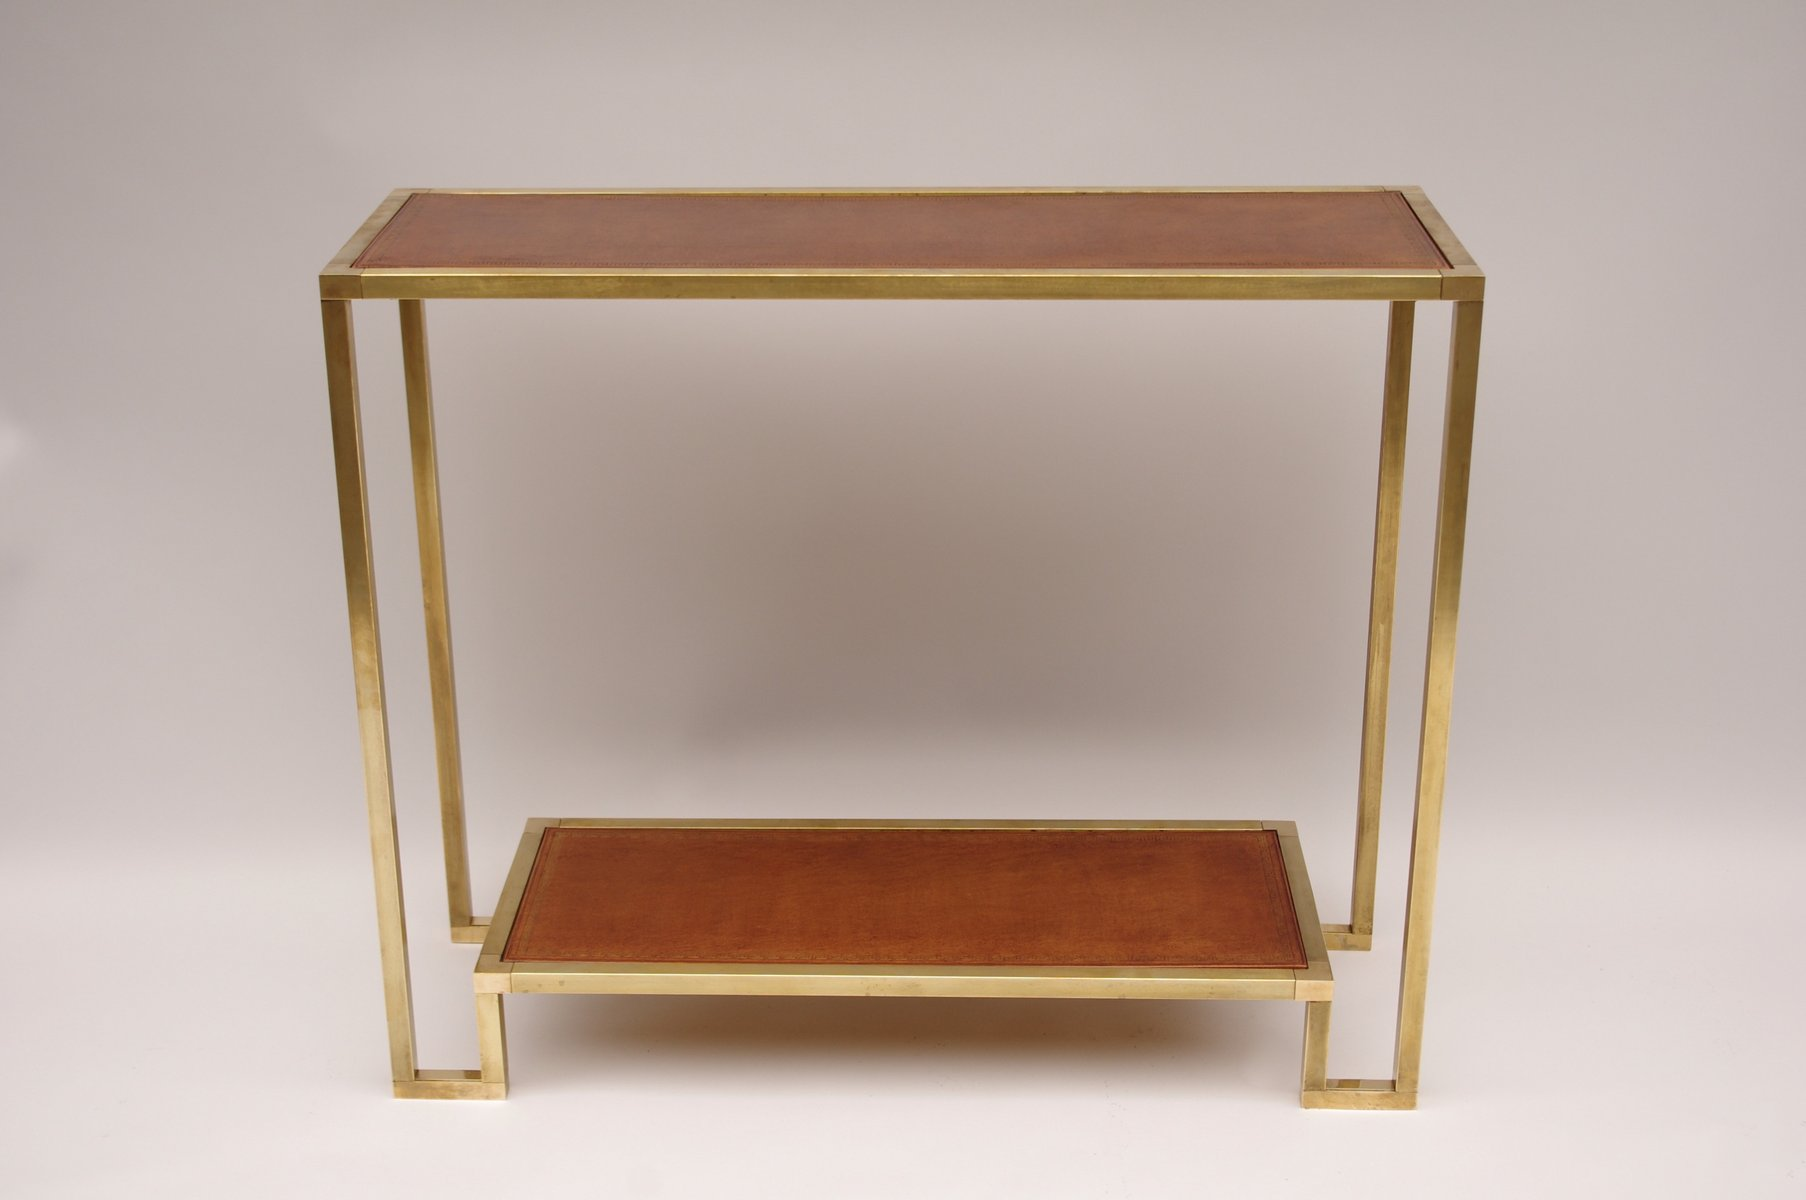 console vintage en laiton dorures avec dessus en cuir en vente sur pamono. Black Bedroom Furniture Sets. Home Design Ideas